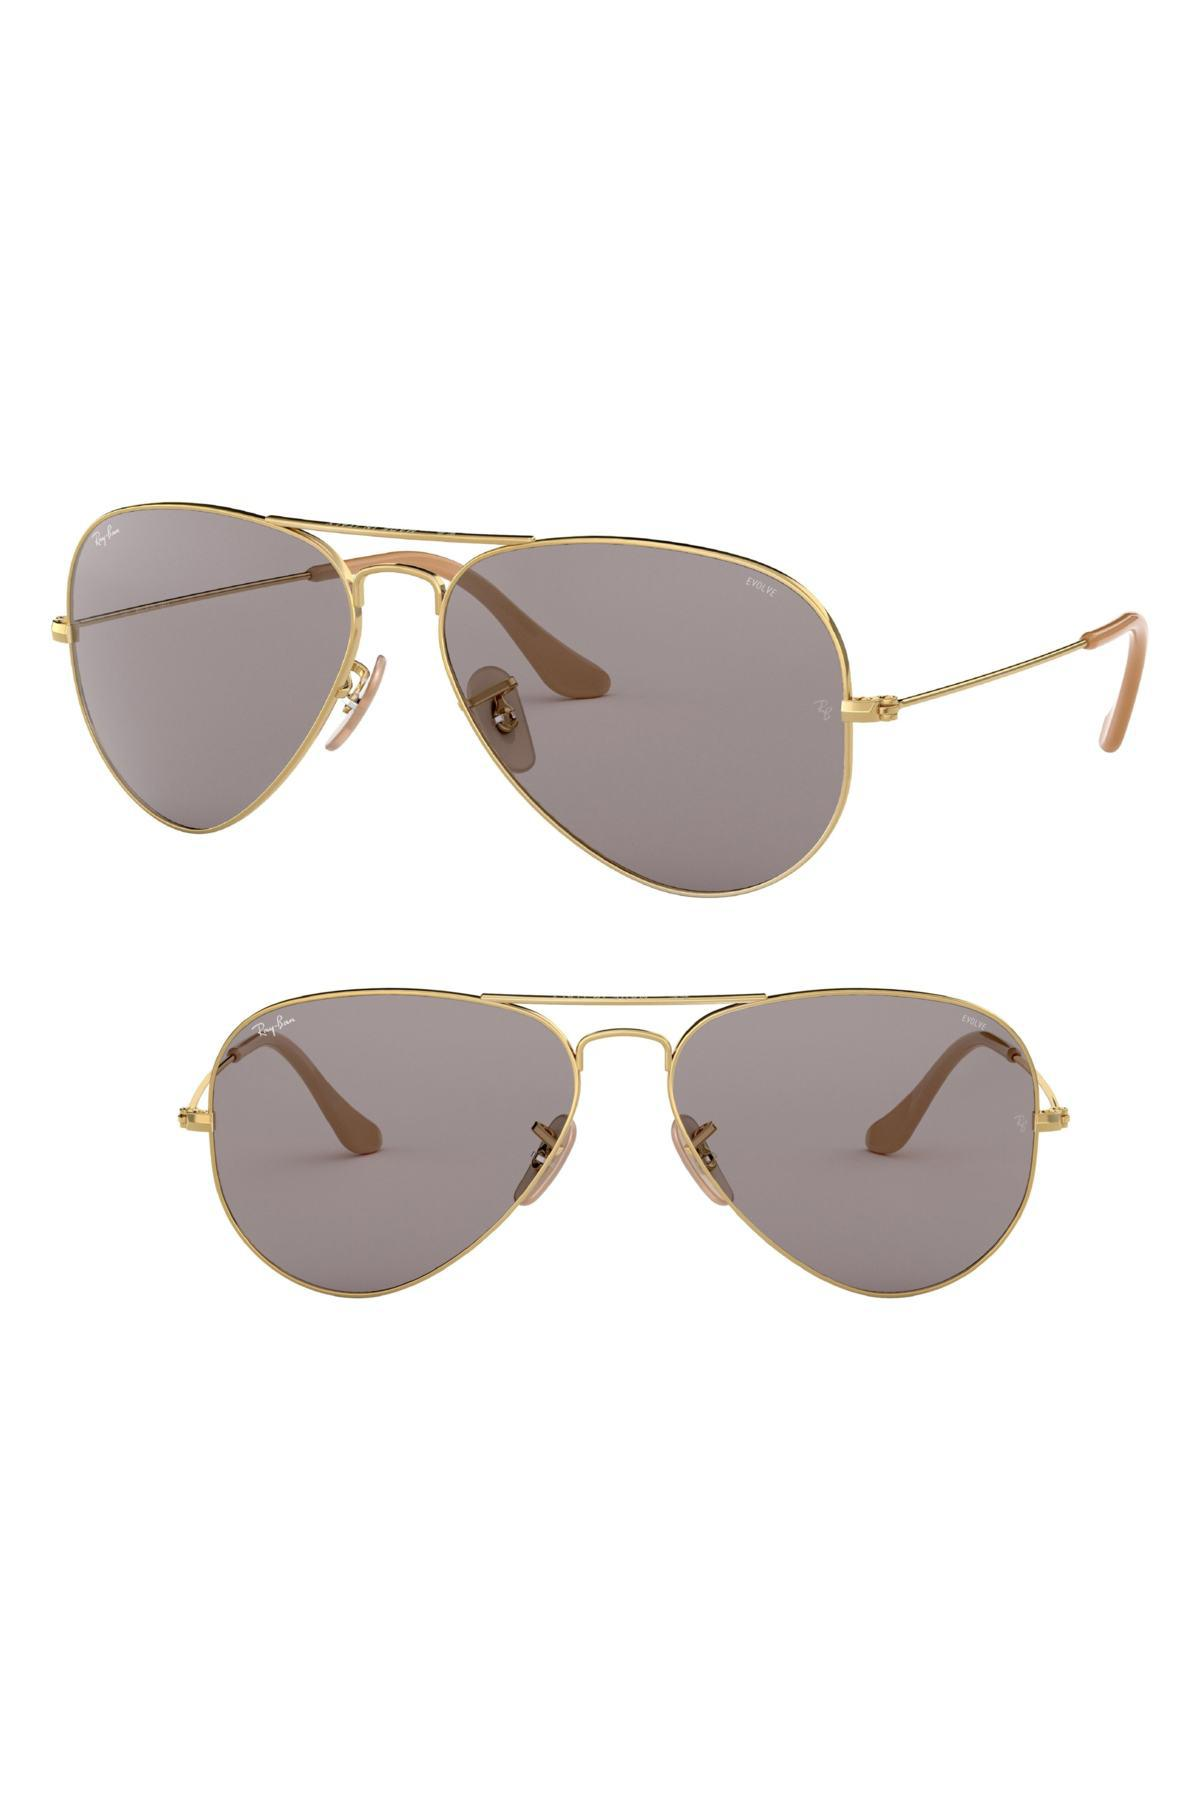 99c92fe343 Ray-Ban Evolve 55mm Photochromic Aviator Sunglasses in Gray - Lyst